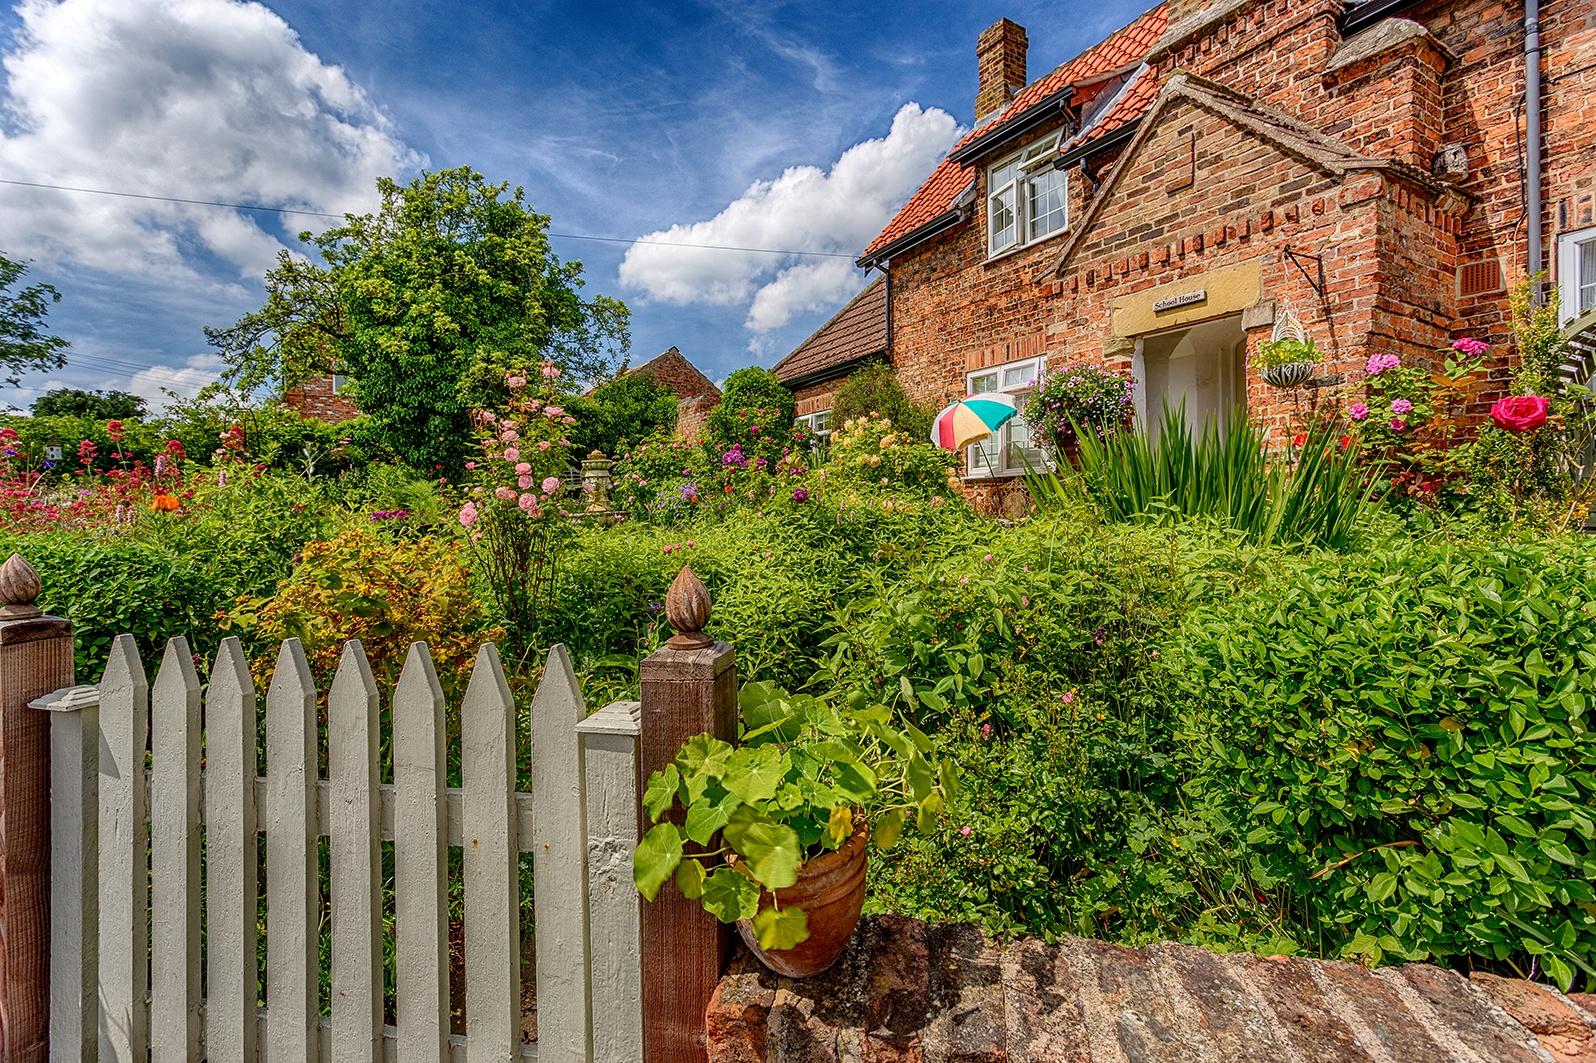 School House Garden by Tony Shaw